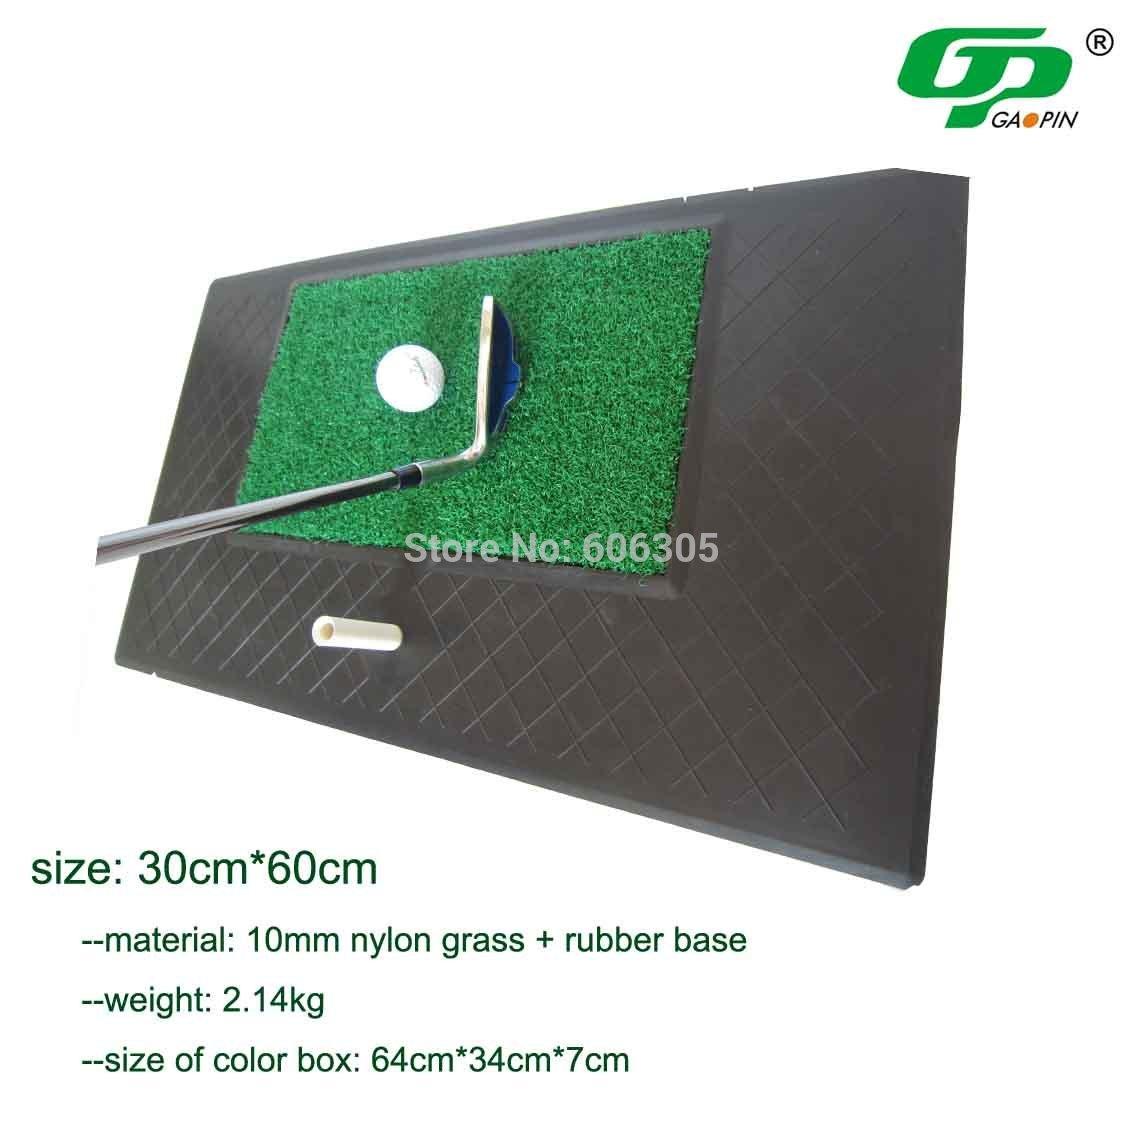 LQX506 mini Golf mat good quality grass a real-nice swing feeling(China (Mainland))